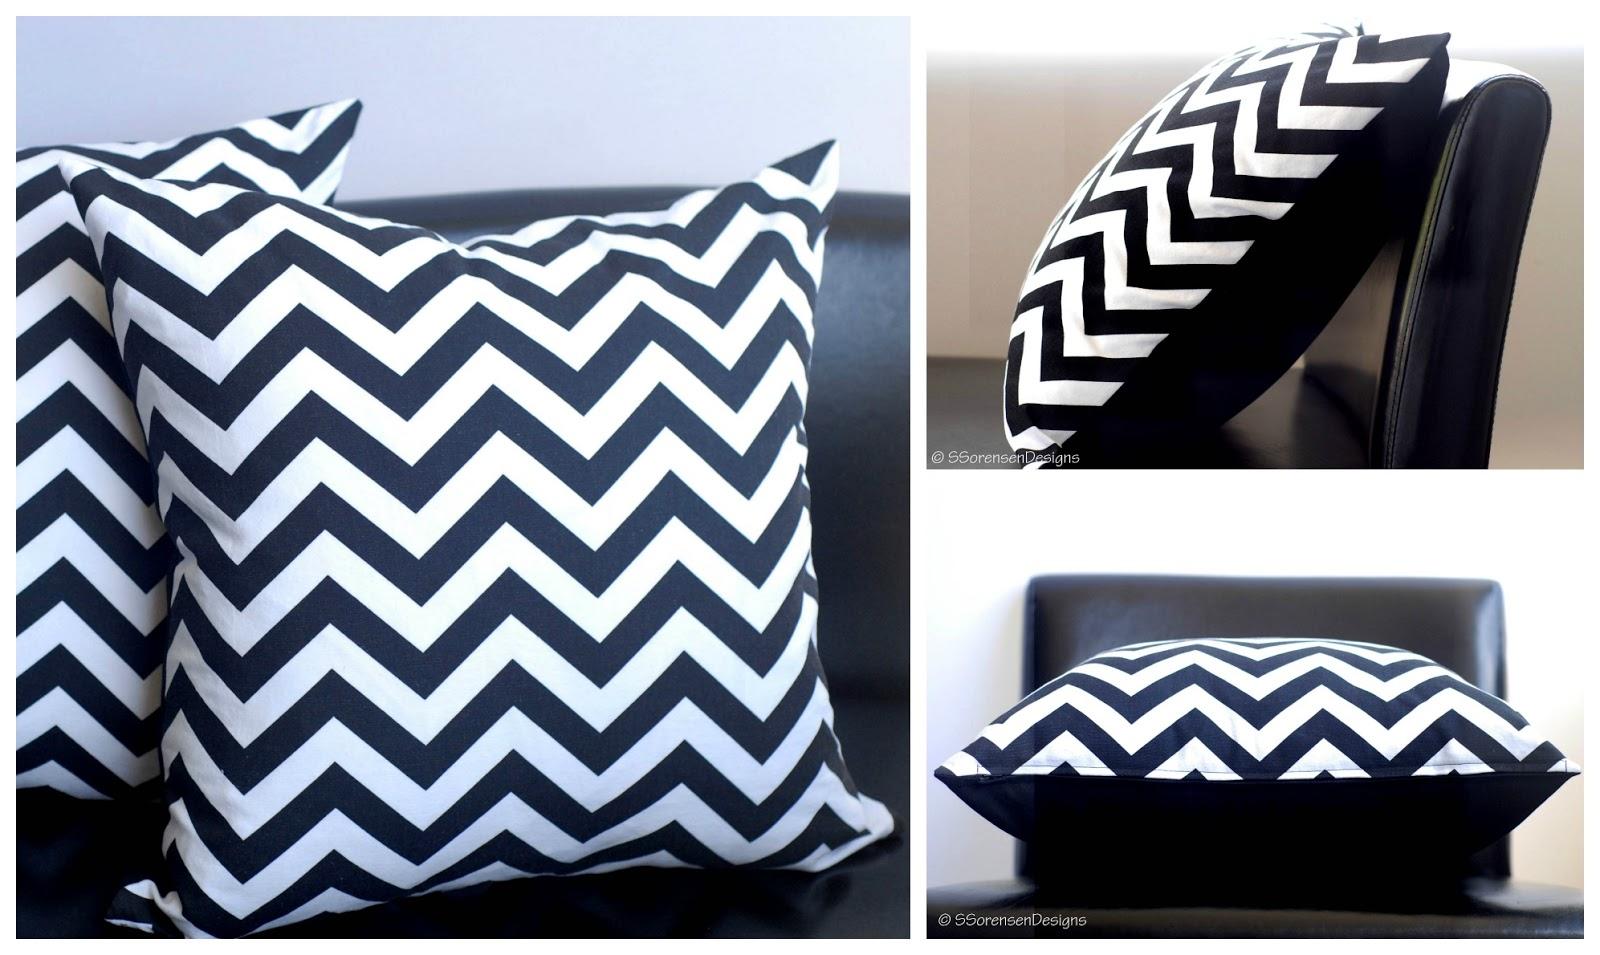 White Design Pillow Case: Sewing  Tutorials  Crafts  DIY  Handmade   Shannon Sews   blog for    ,